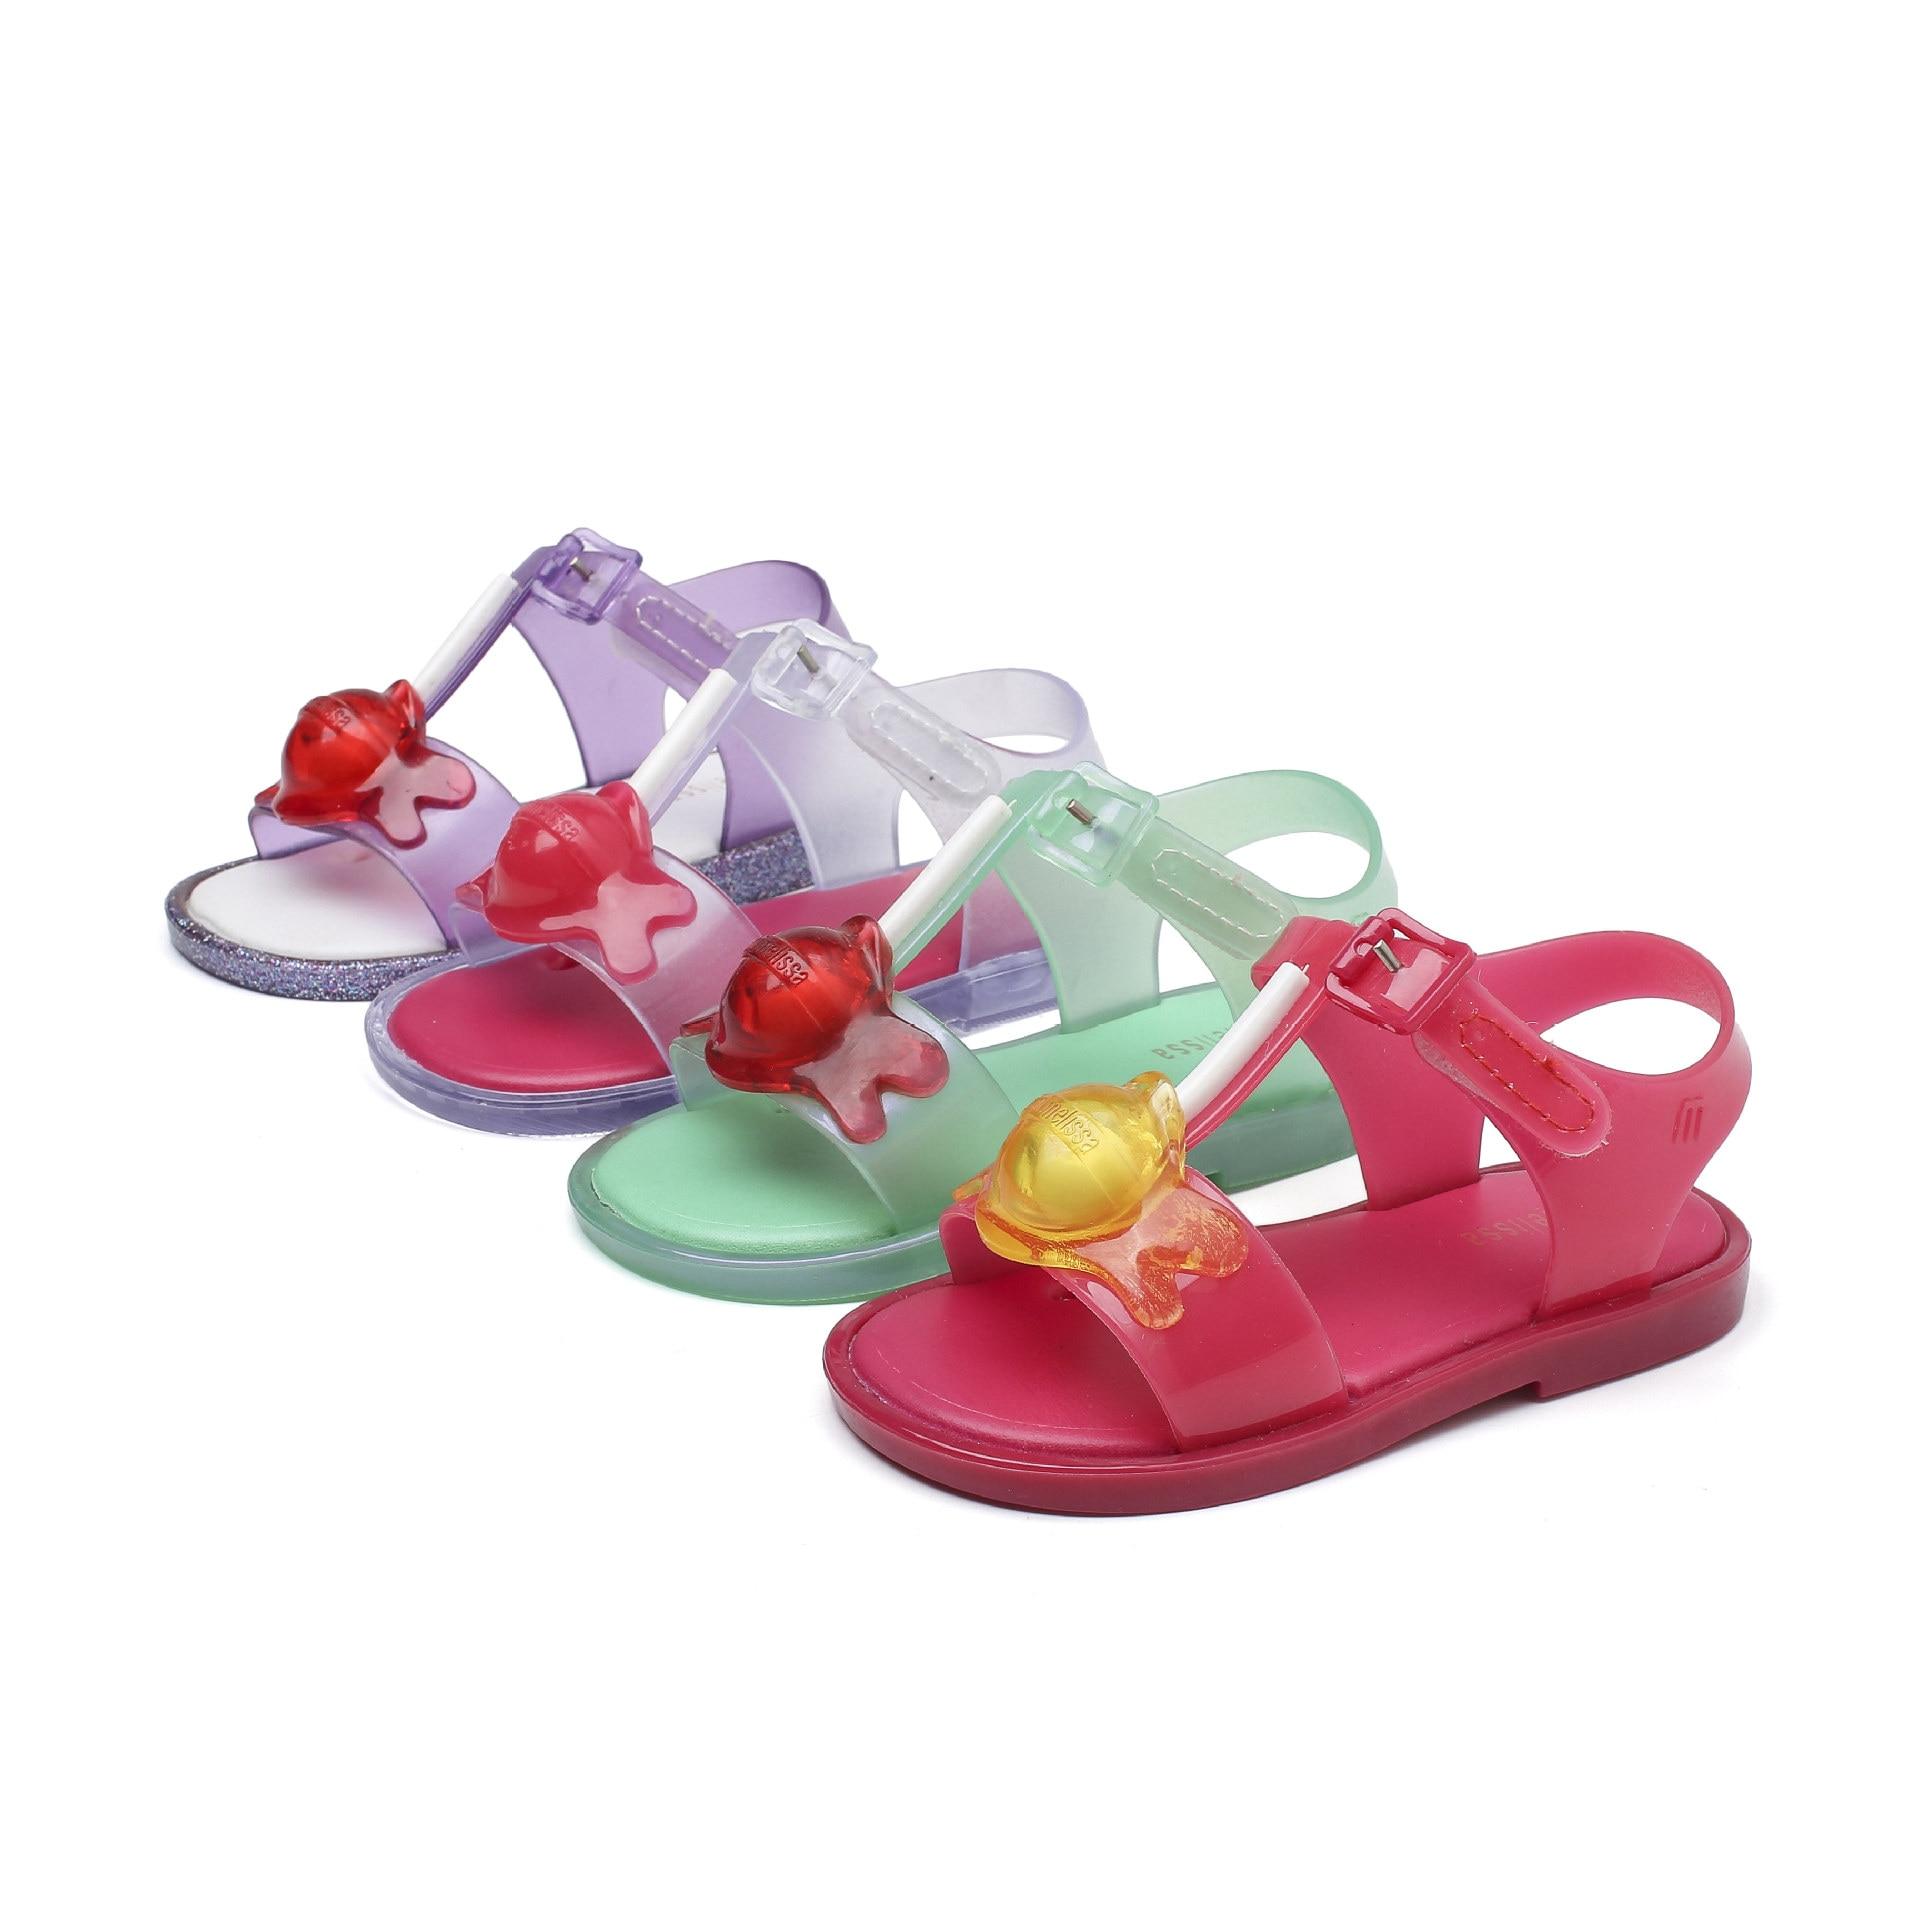 Mini Melissa Lollipop Girl Sandals New Original Girl Jelly Shoes Kids Sandals Children Beach Non-slip Toddlder Candy ShoeSH19085